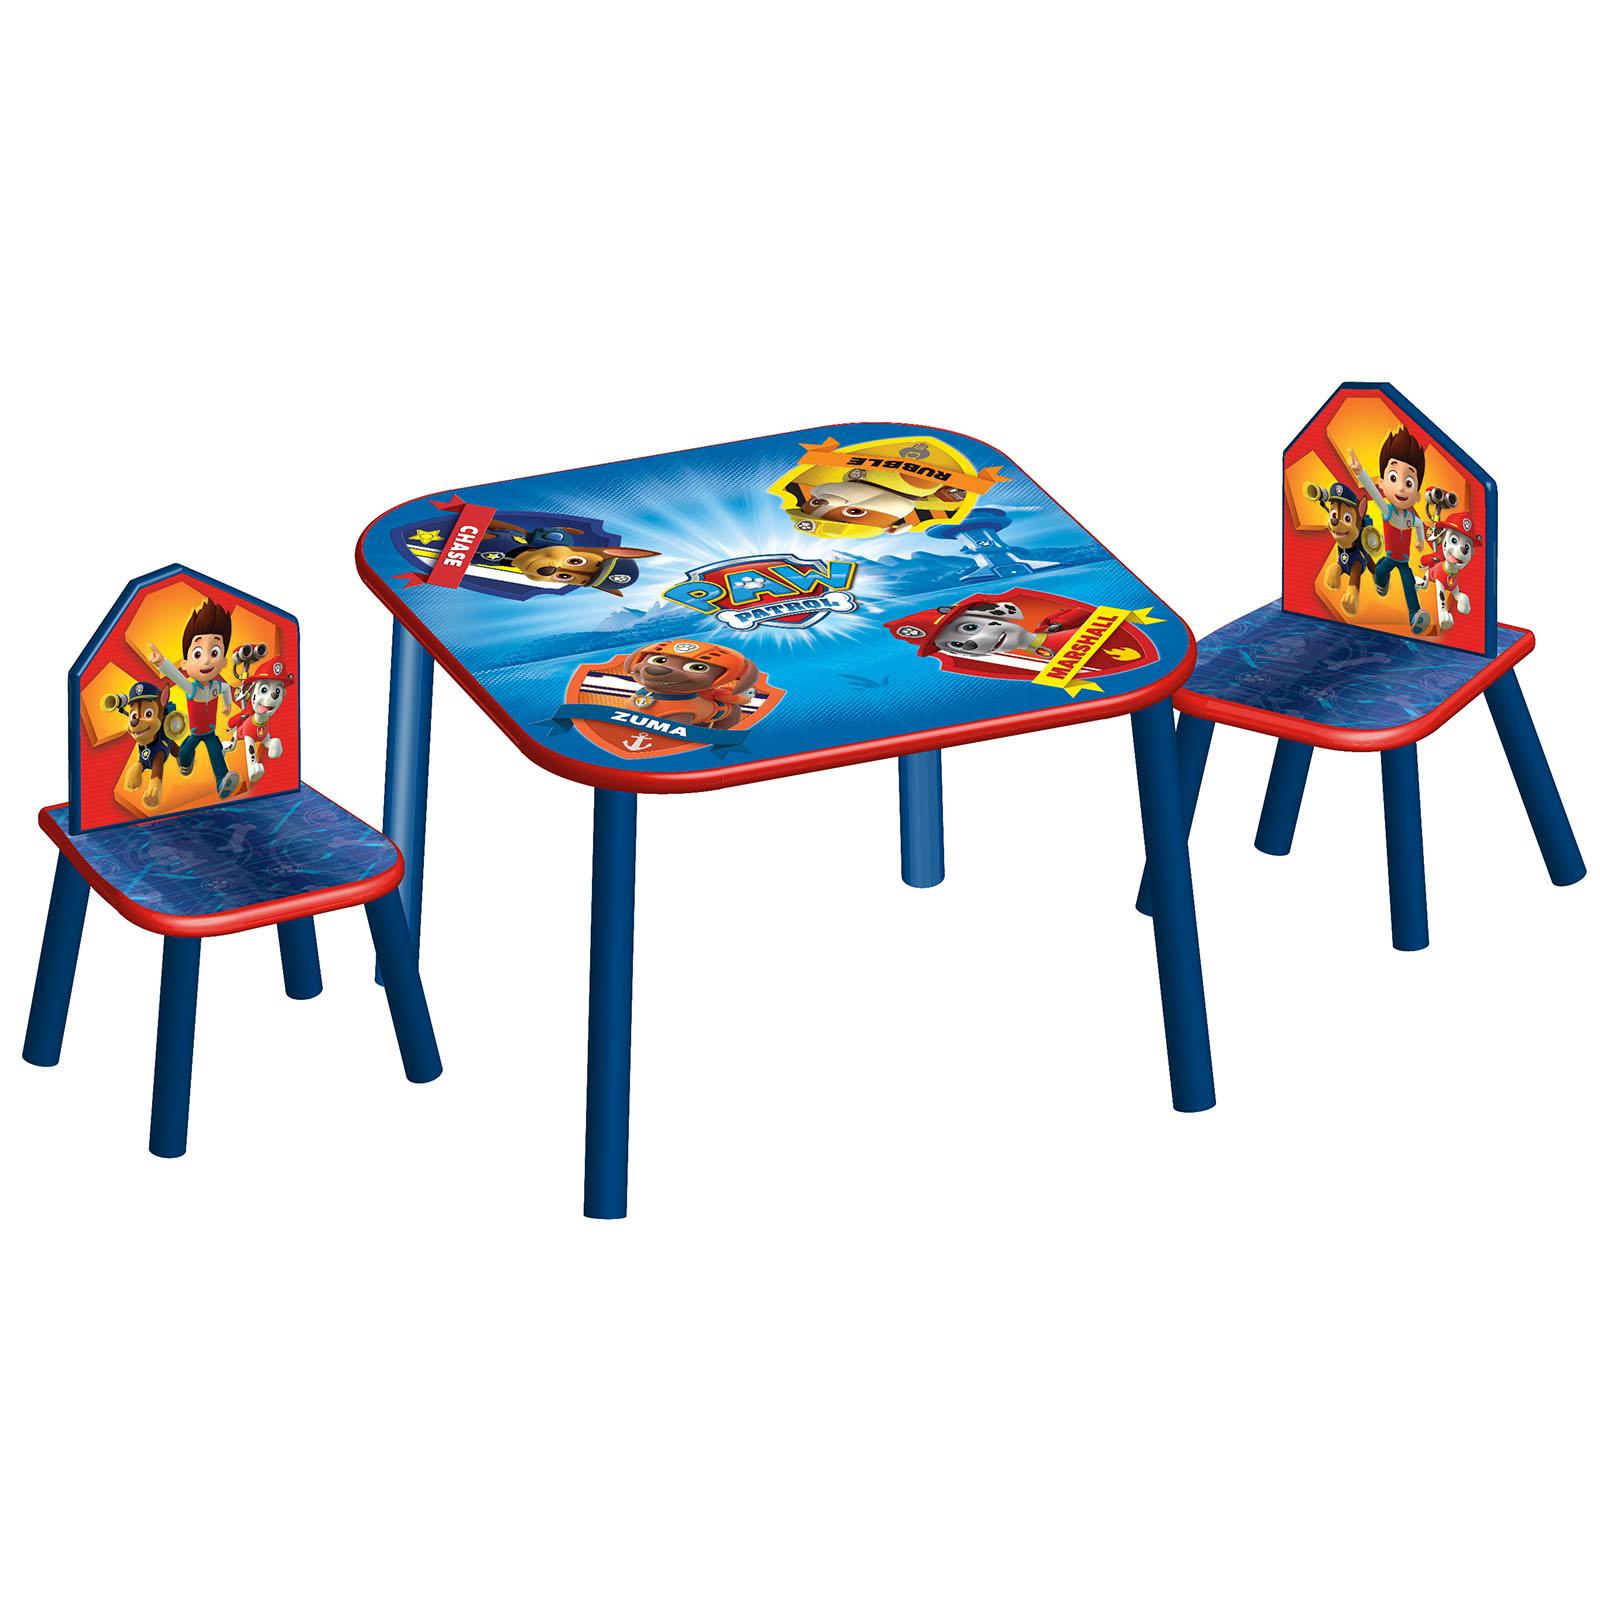 Delta Children Table & Chairs Set Paw Patrol